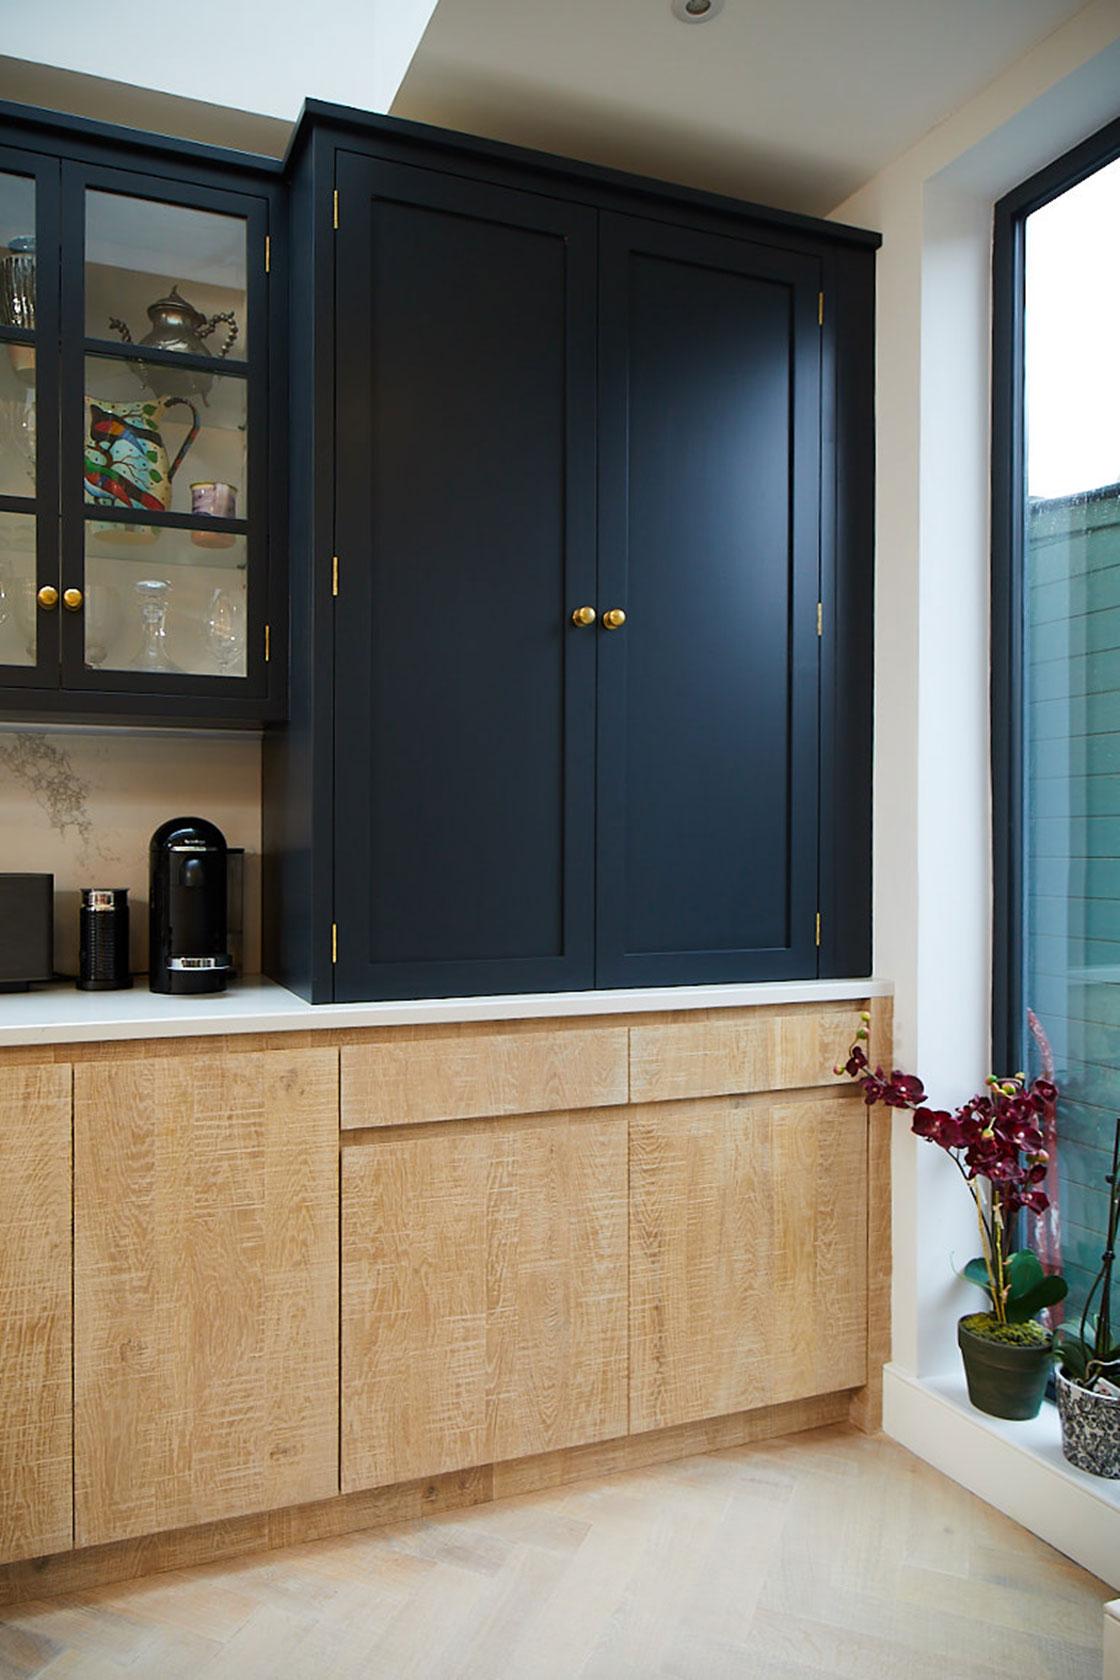 Dark blue shaker wall cabinets sit on Caesarstone worktop with limed oak slab base units below